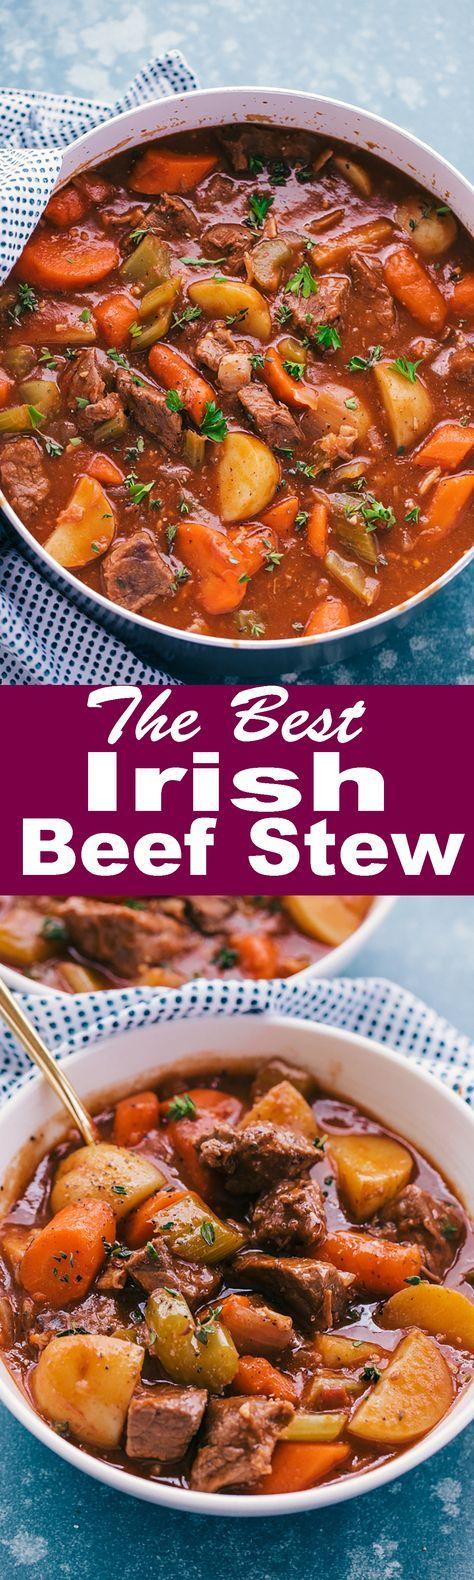 Best Irish Beef Stew - The Food Cafe